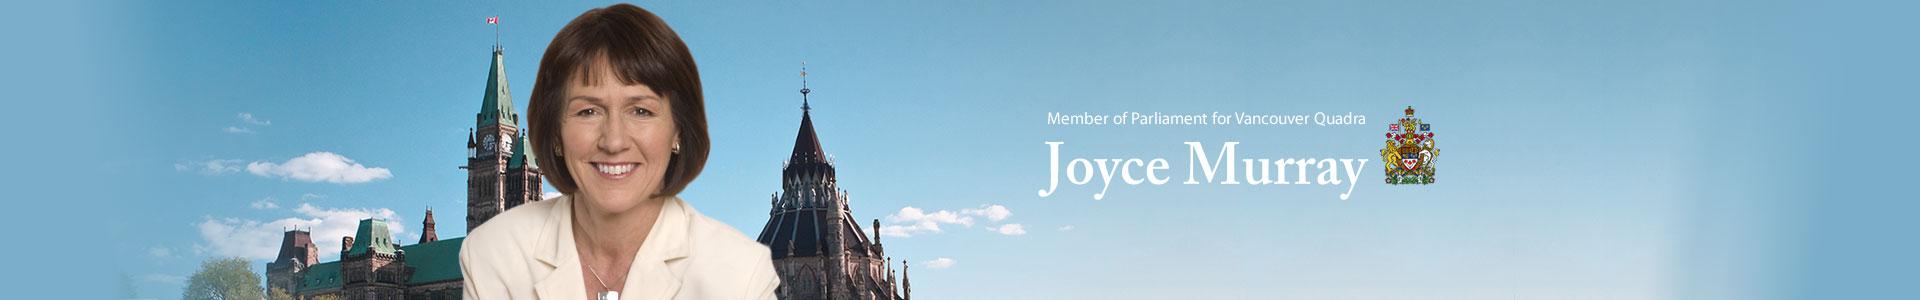 Joyce-Murray-banner-pic.jpg